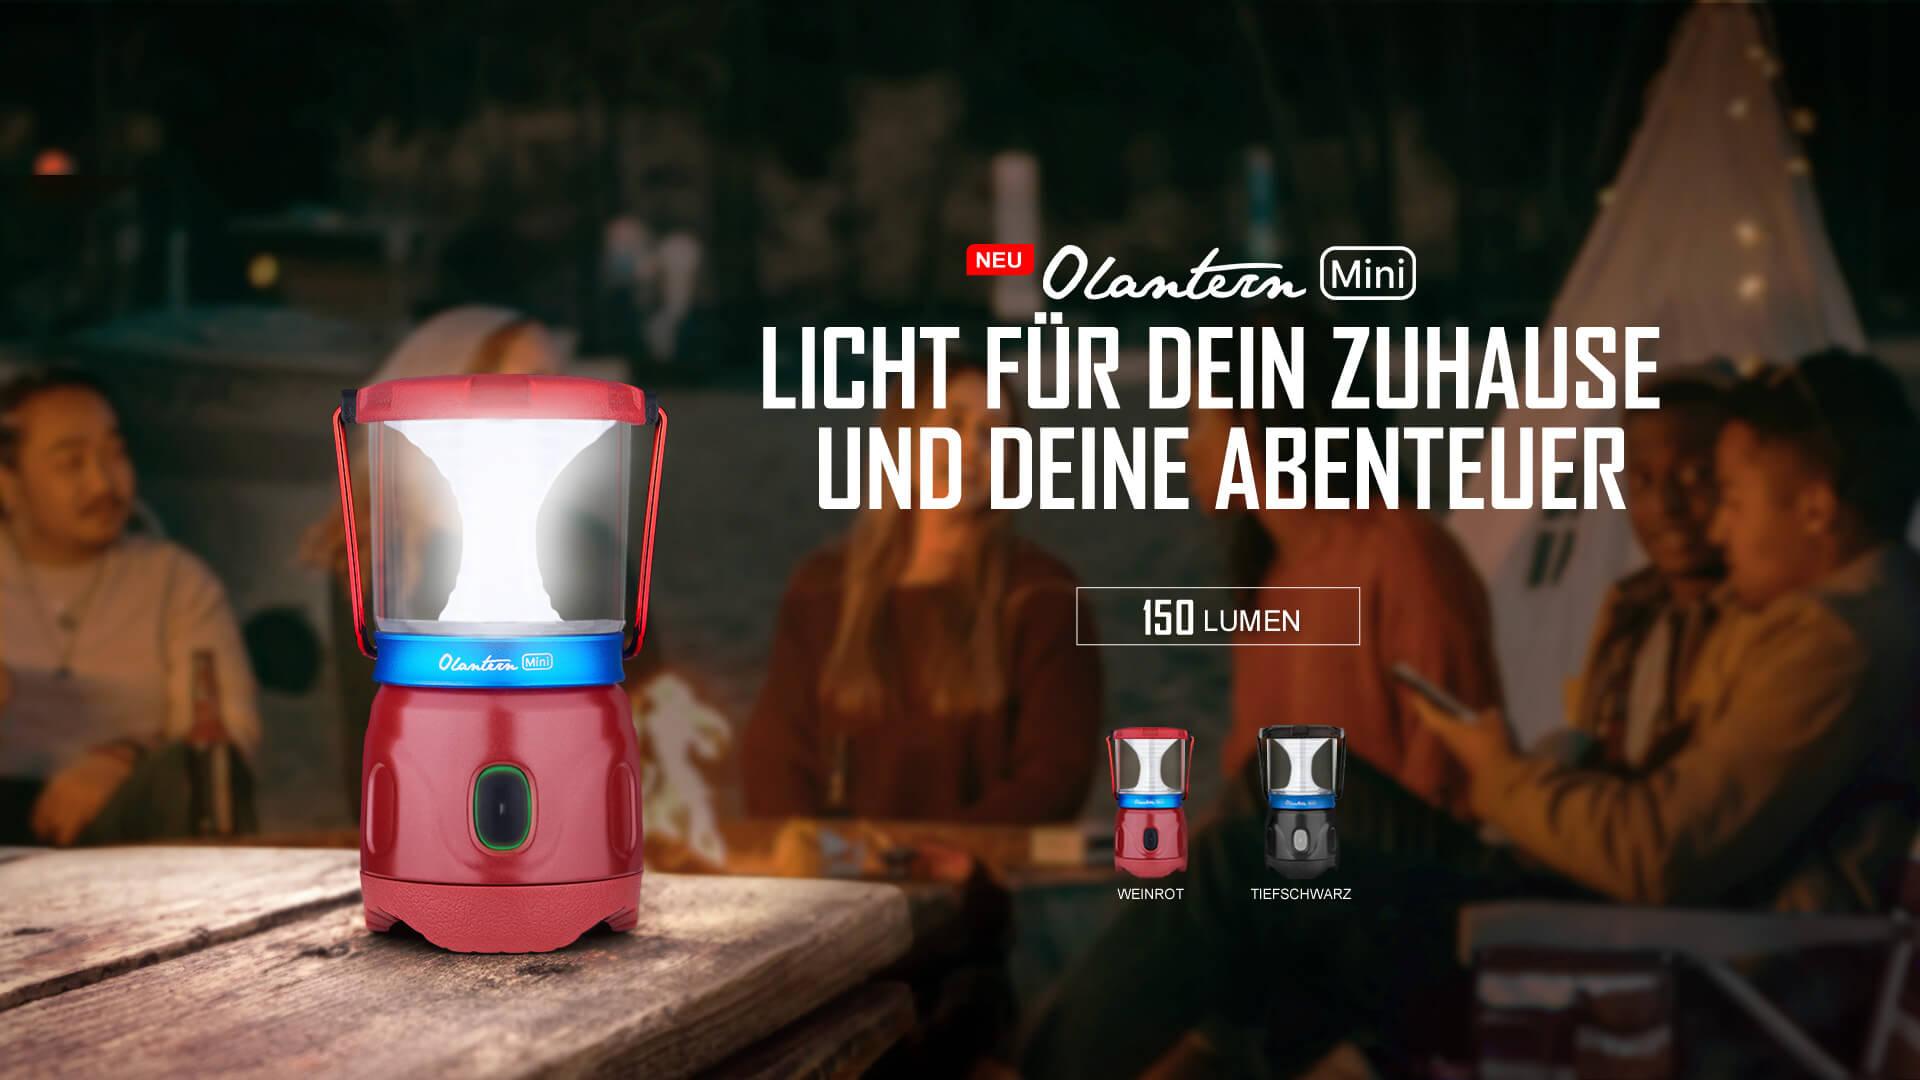 Olight Olantern mini Campinglampe